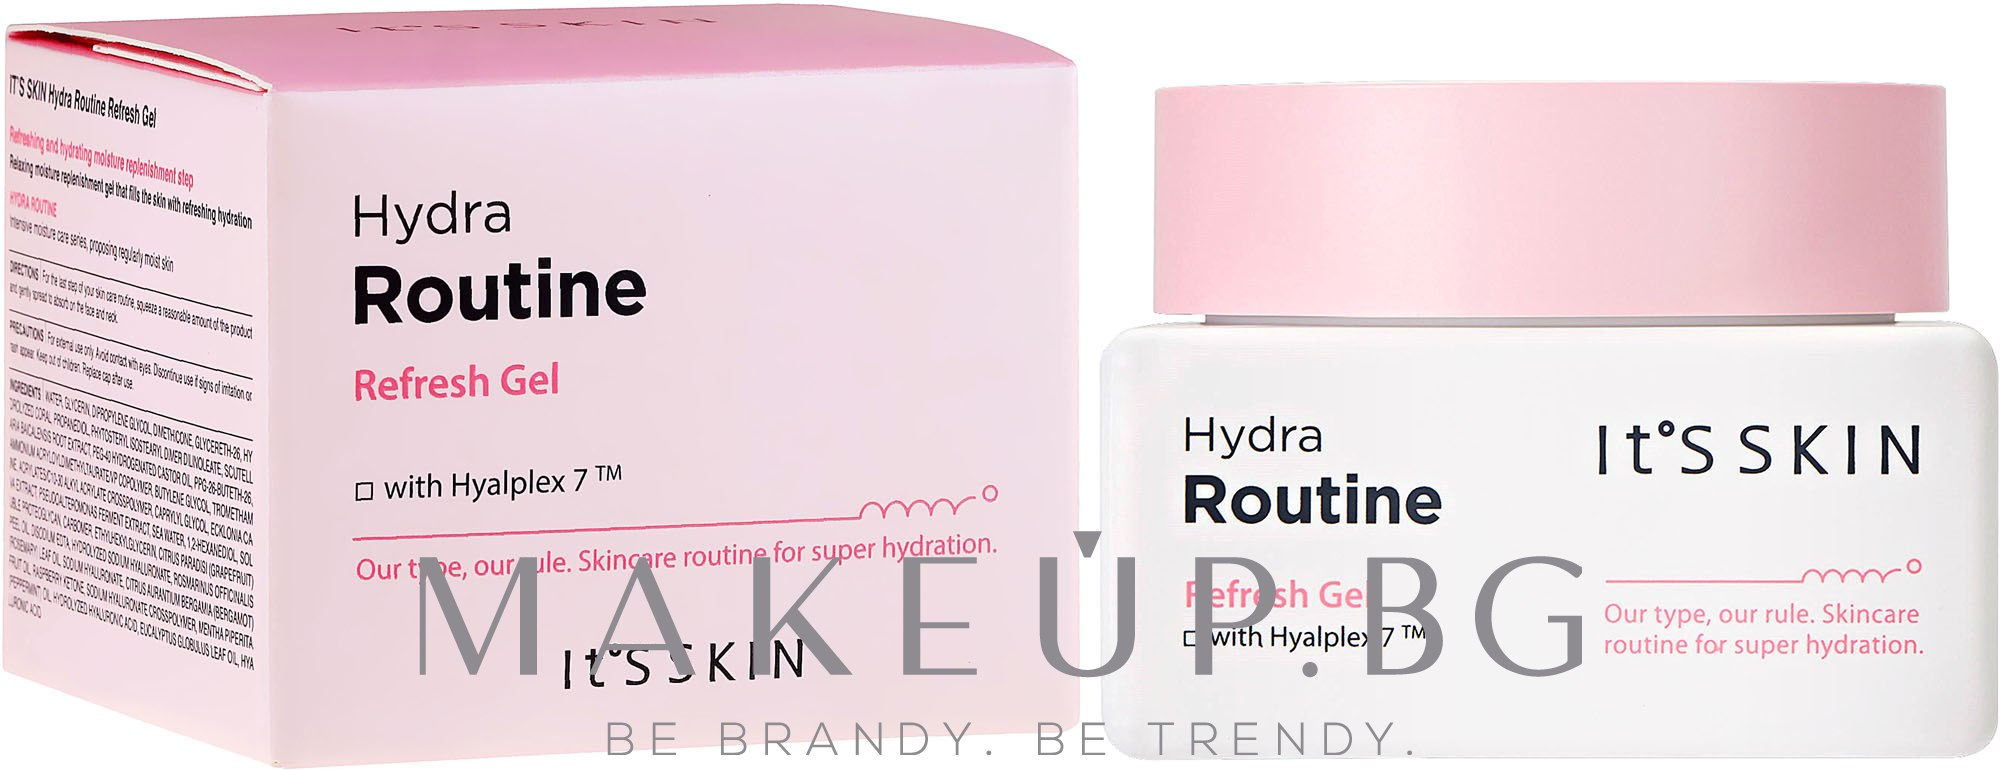 Овлажняващ гел за лице - It's Skin Hydra Routine Refresh Gel — снимка 50 ml